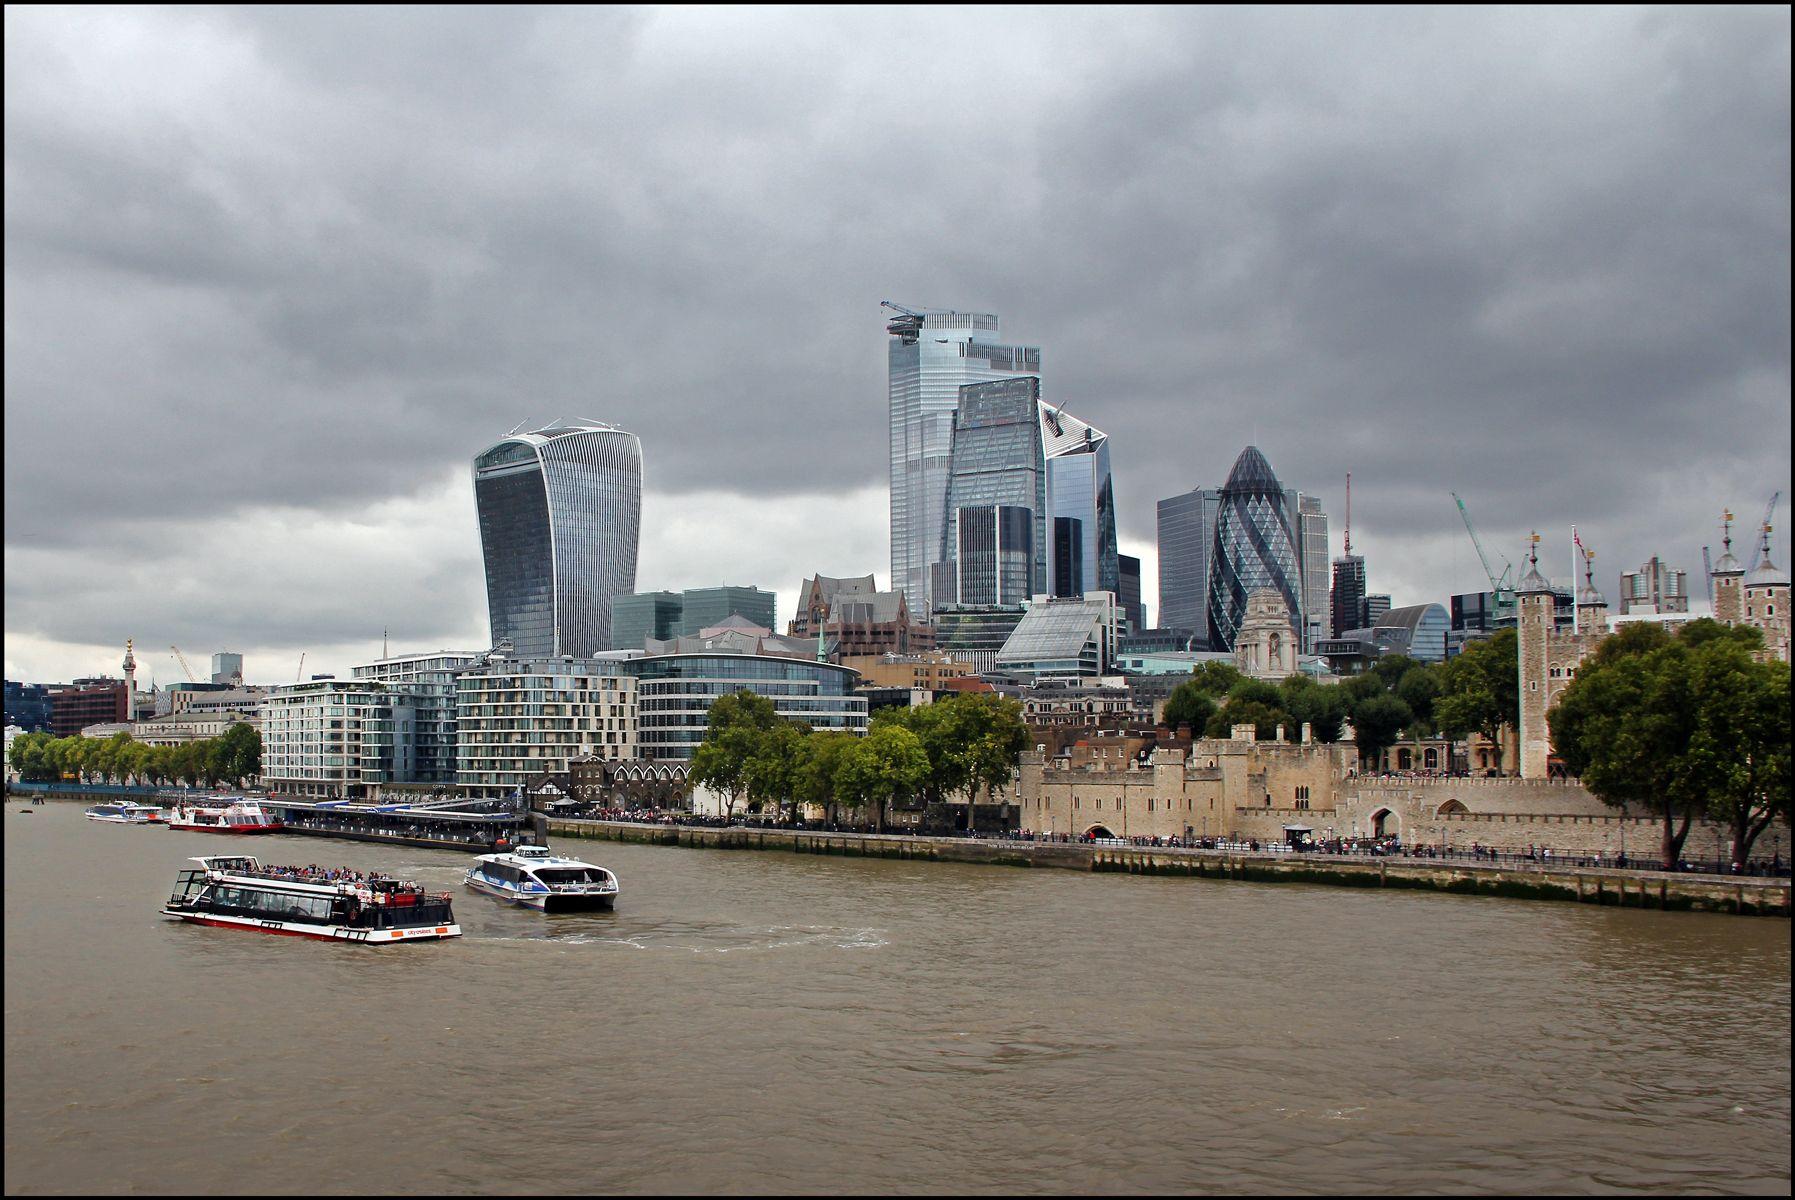 Лондонские зарисовки. Тауэр с Темзы. Лондон Тауэр р.Темза символ Лондона и Британии